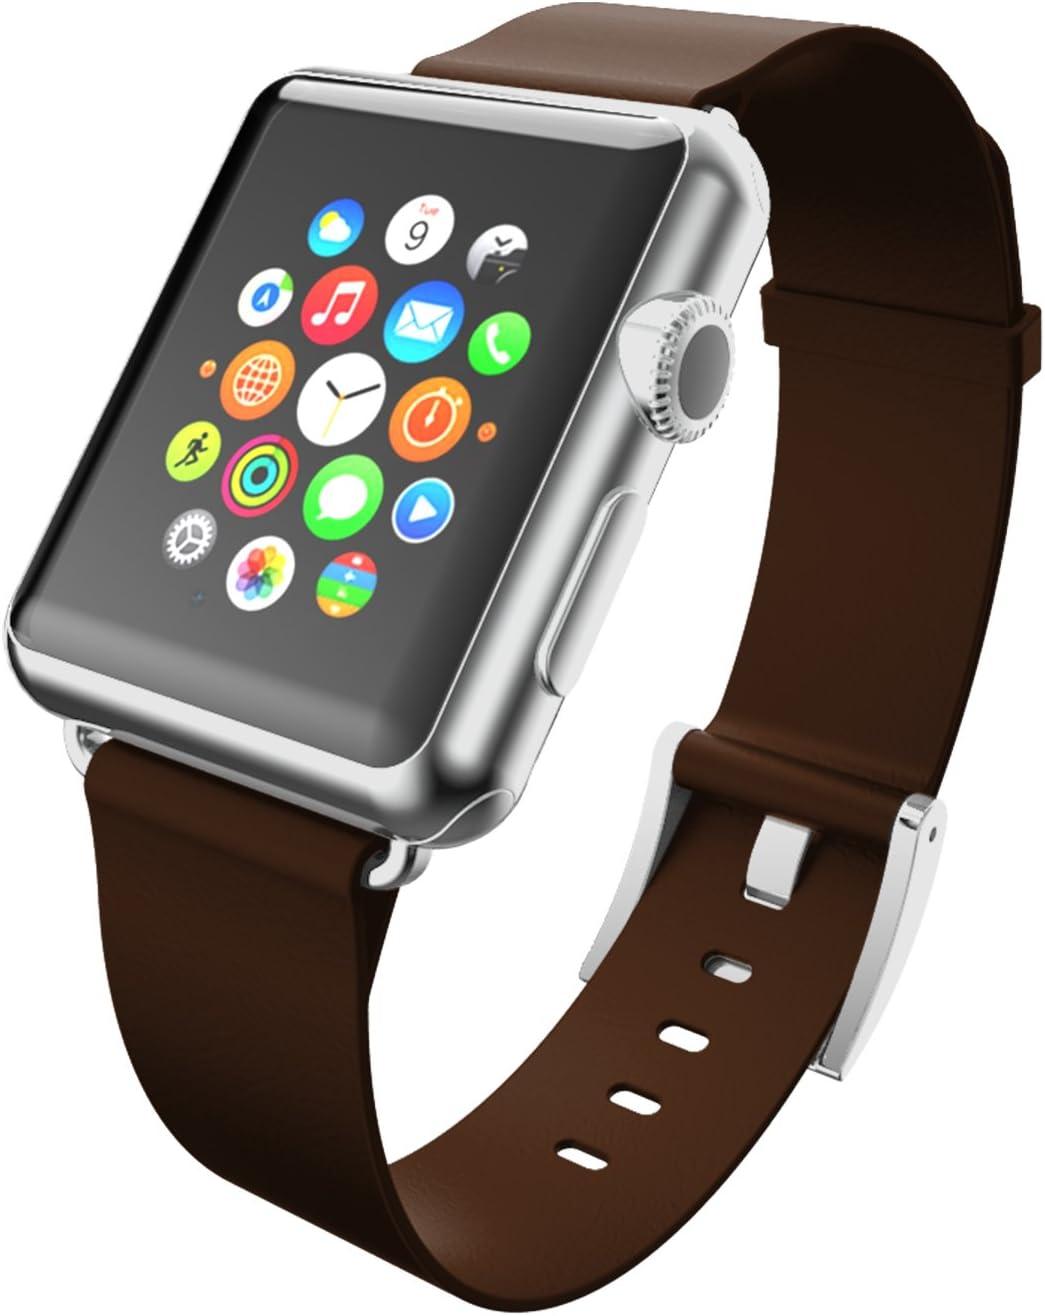 Mail order cheap Incipio Apple Watch 38mm Premium Leather Espresso Watchband 55% OFF -